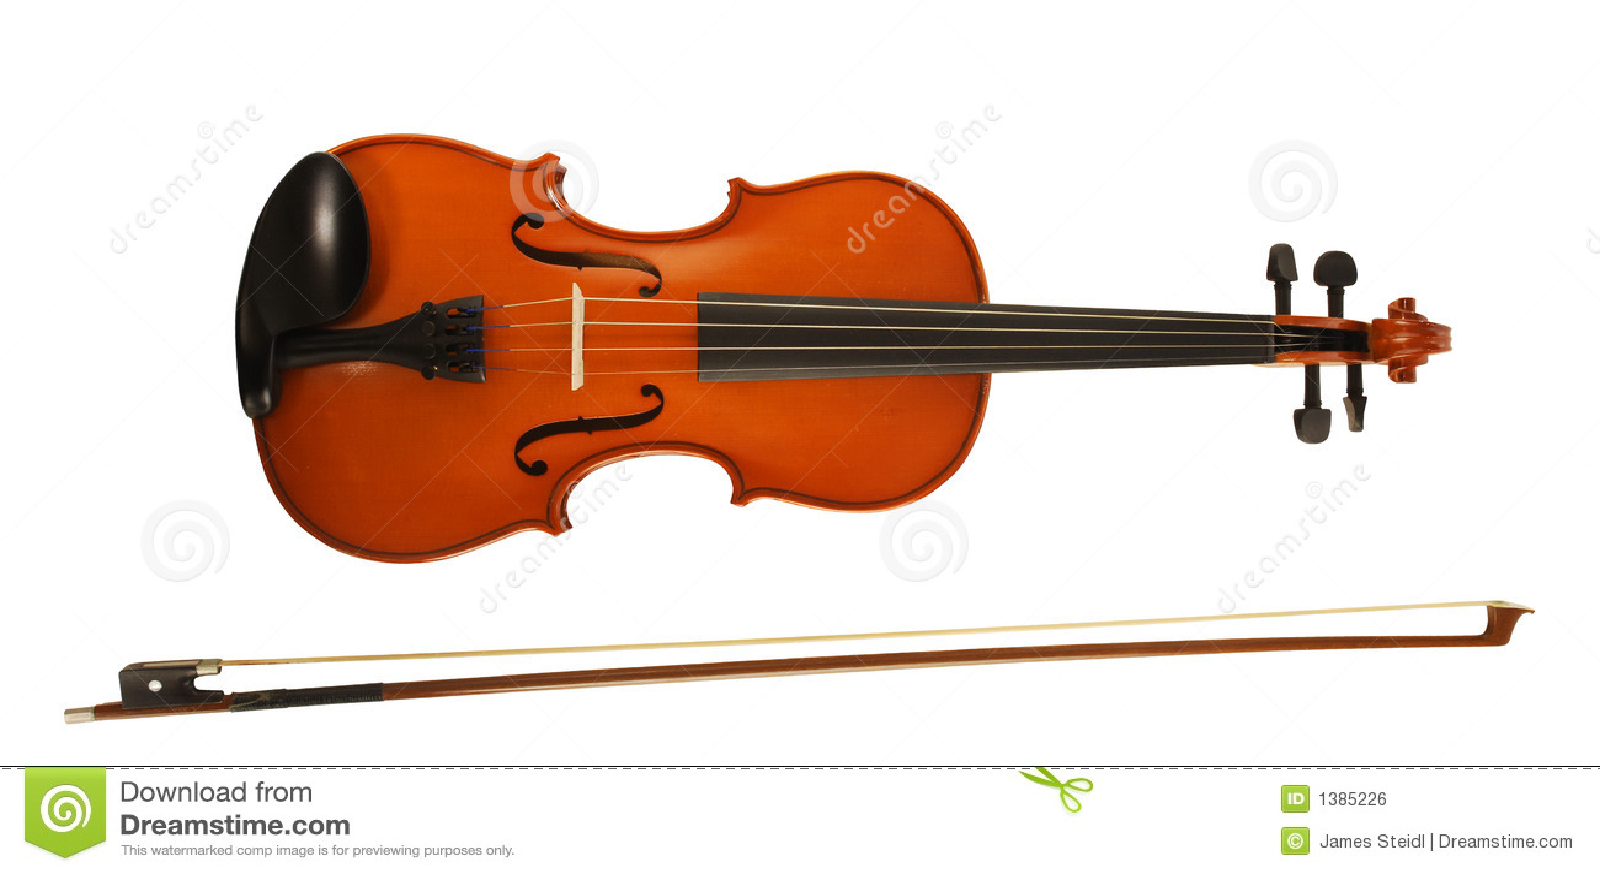 Violin & Bow Royalty Free Stock Image - Image: 1385226